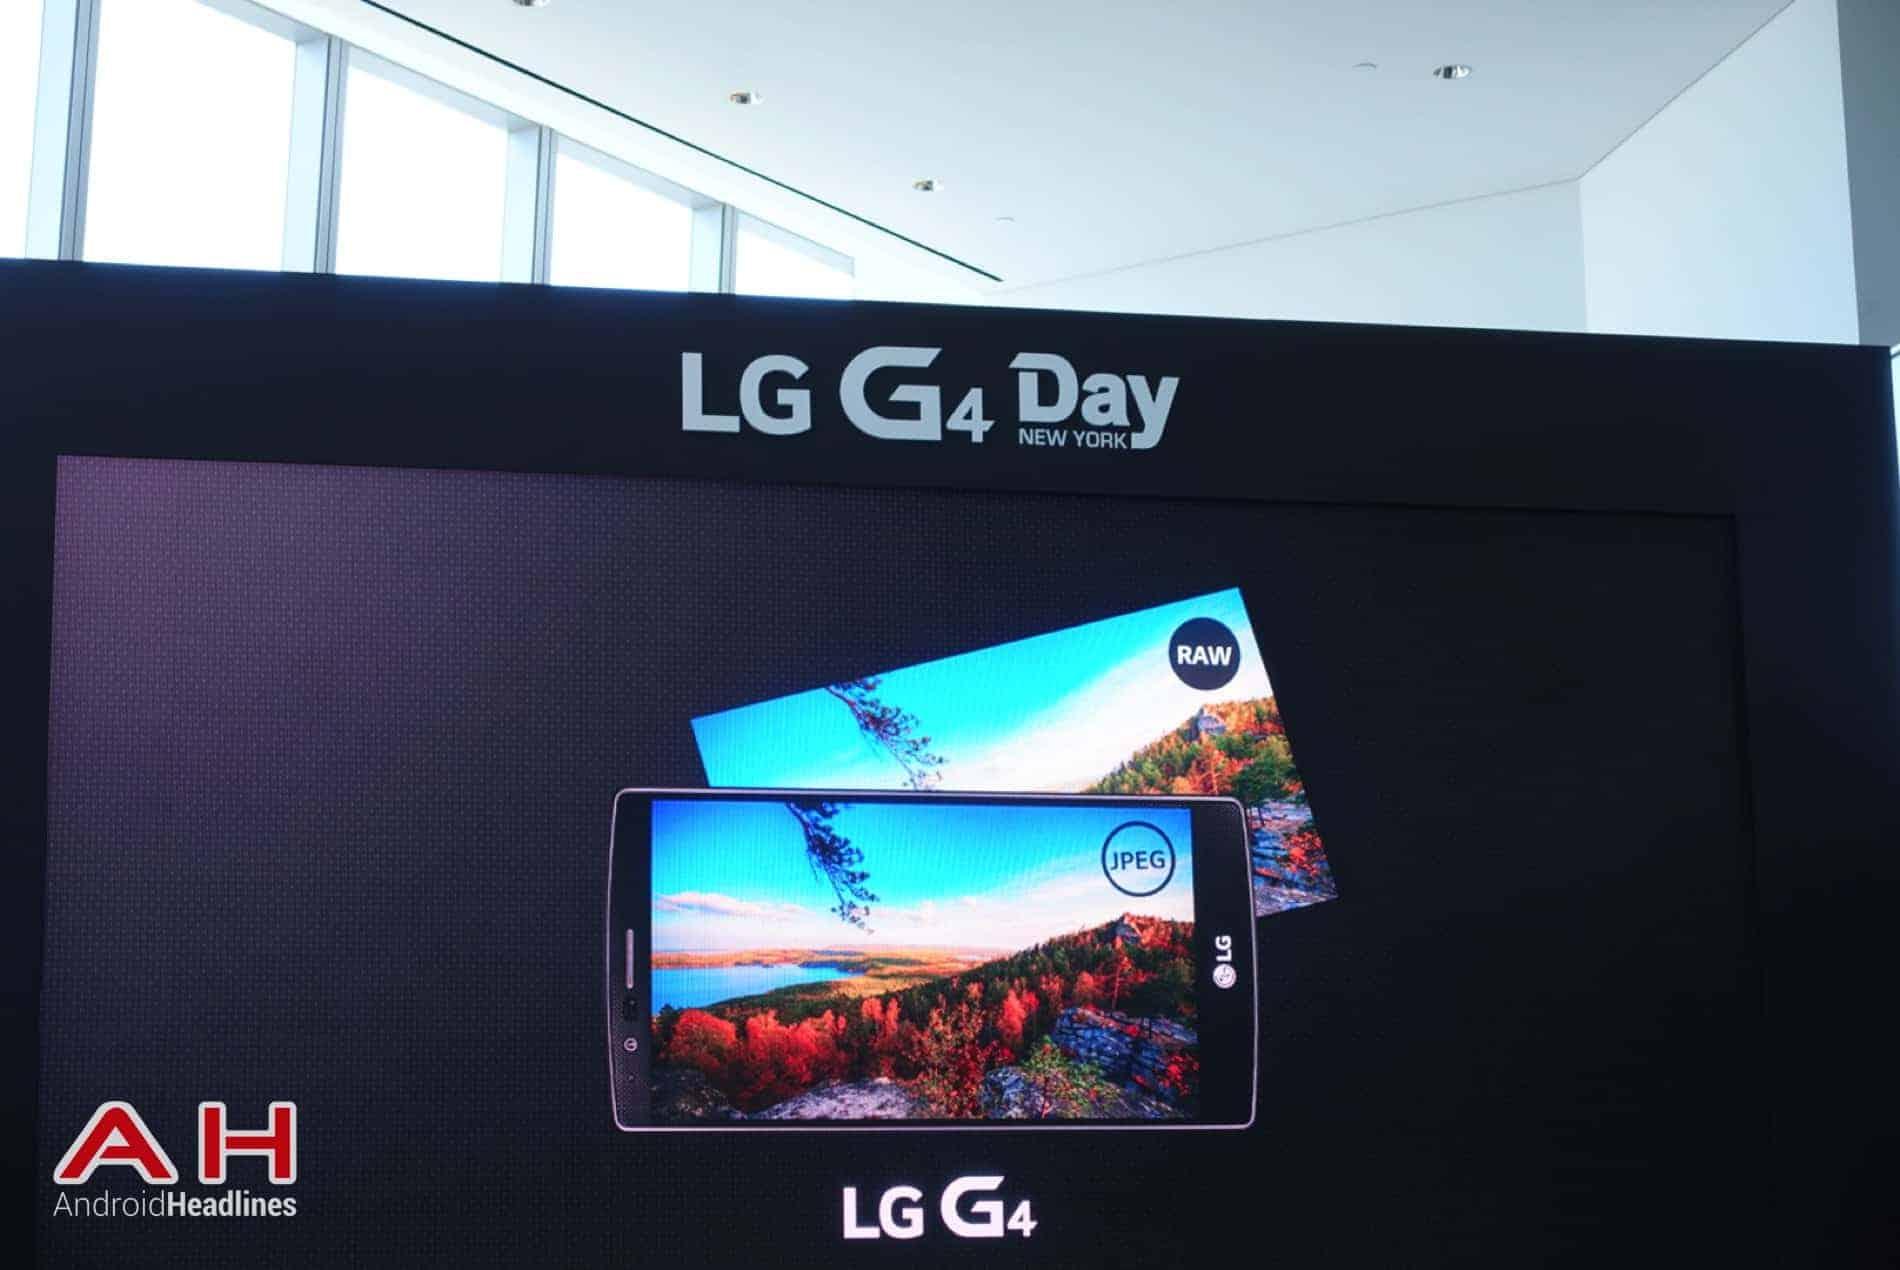 LG G4 Day AH 03 181